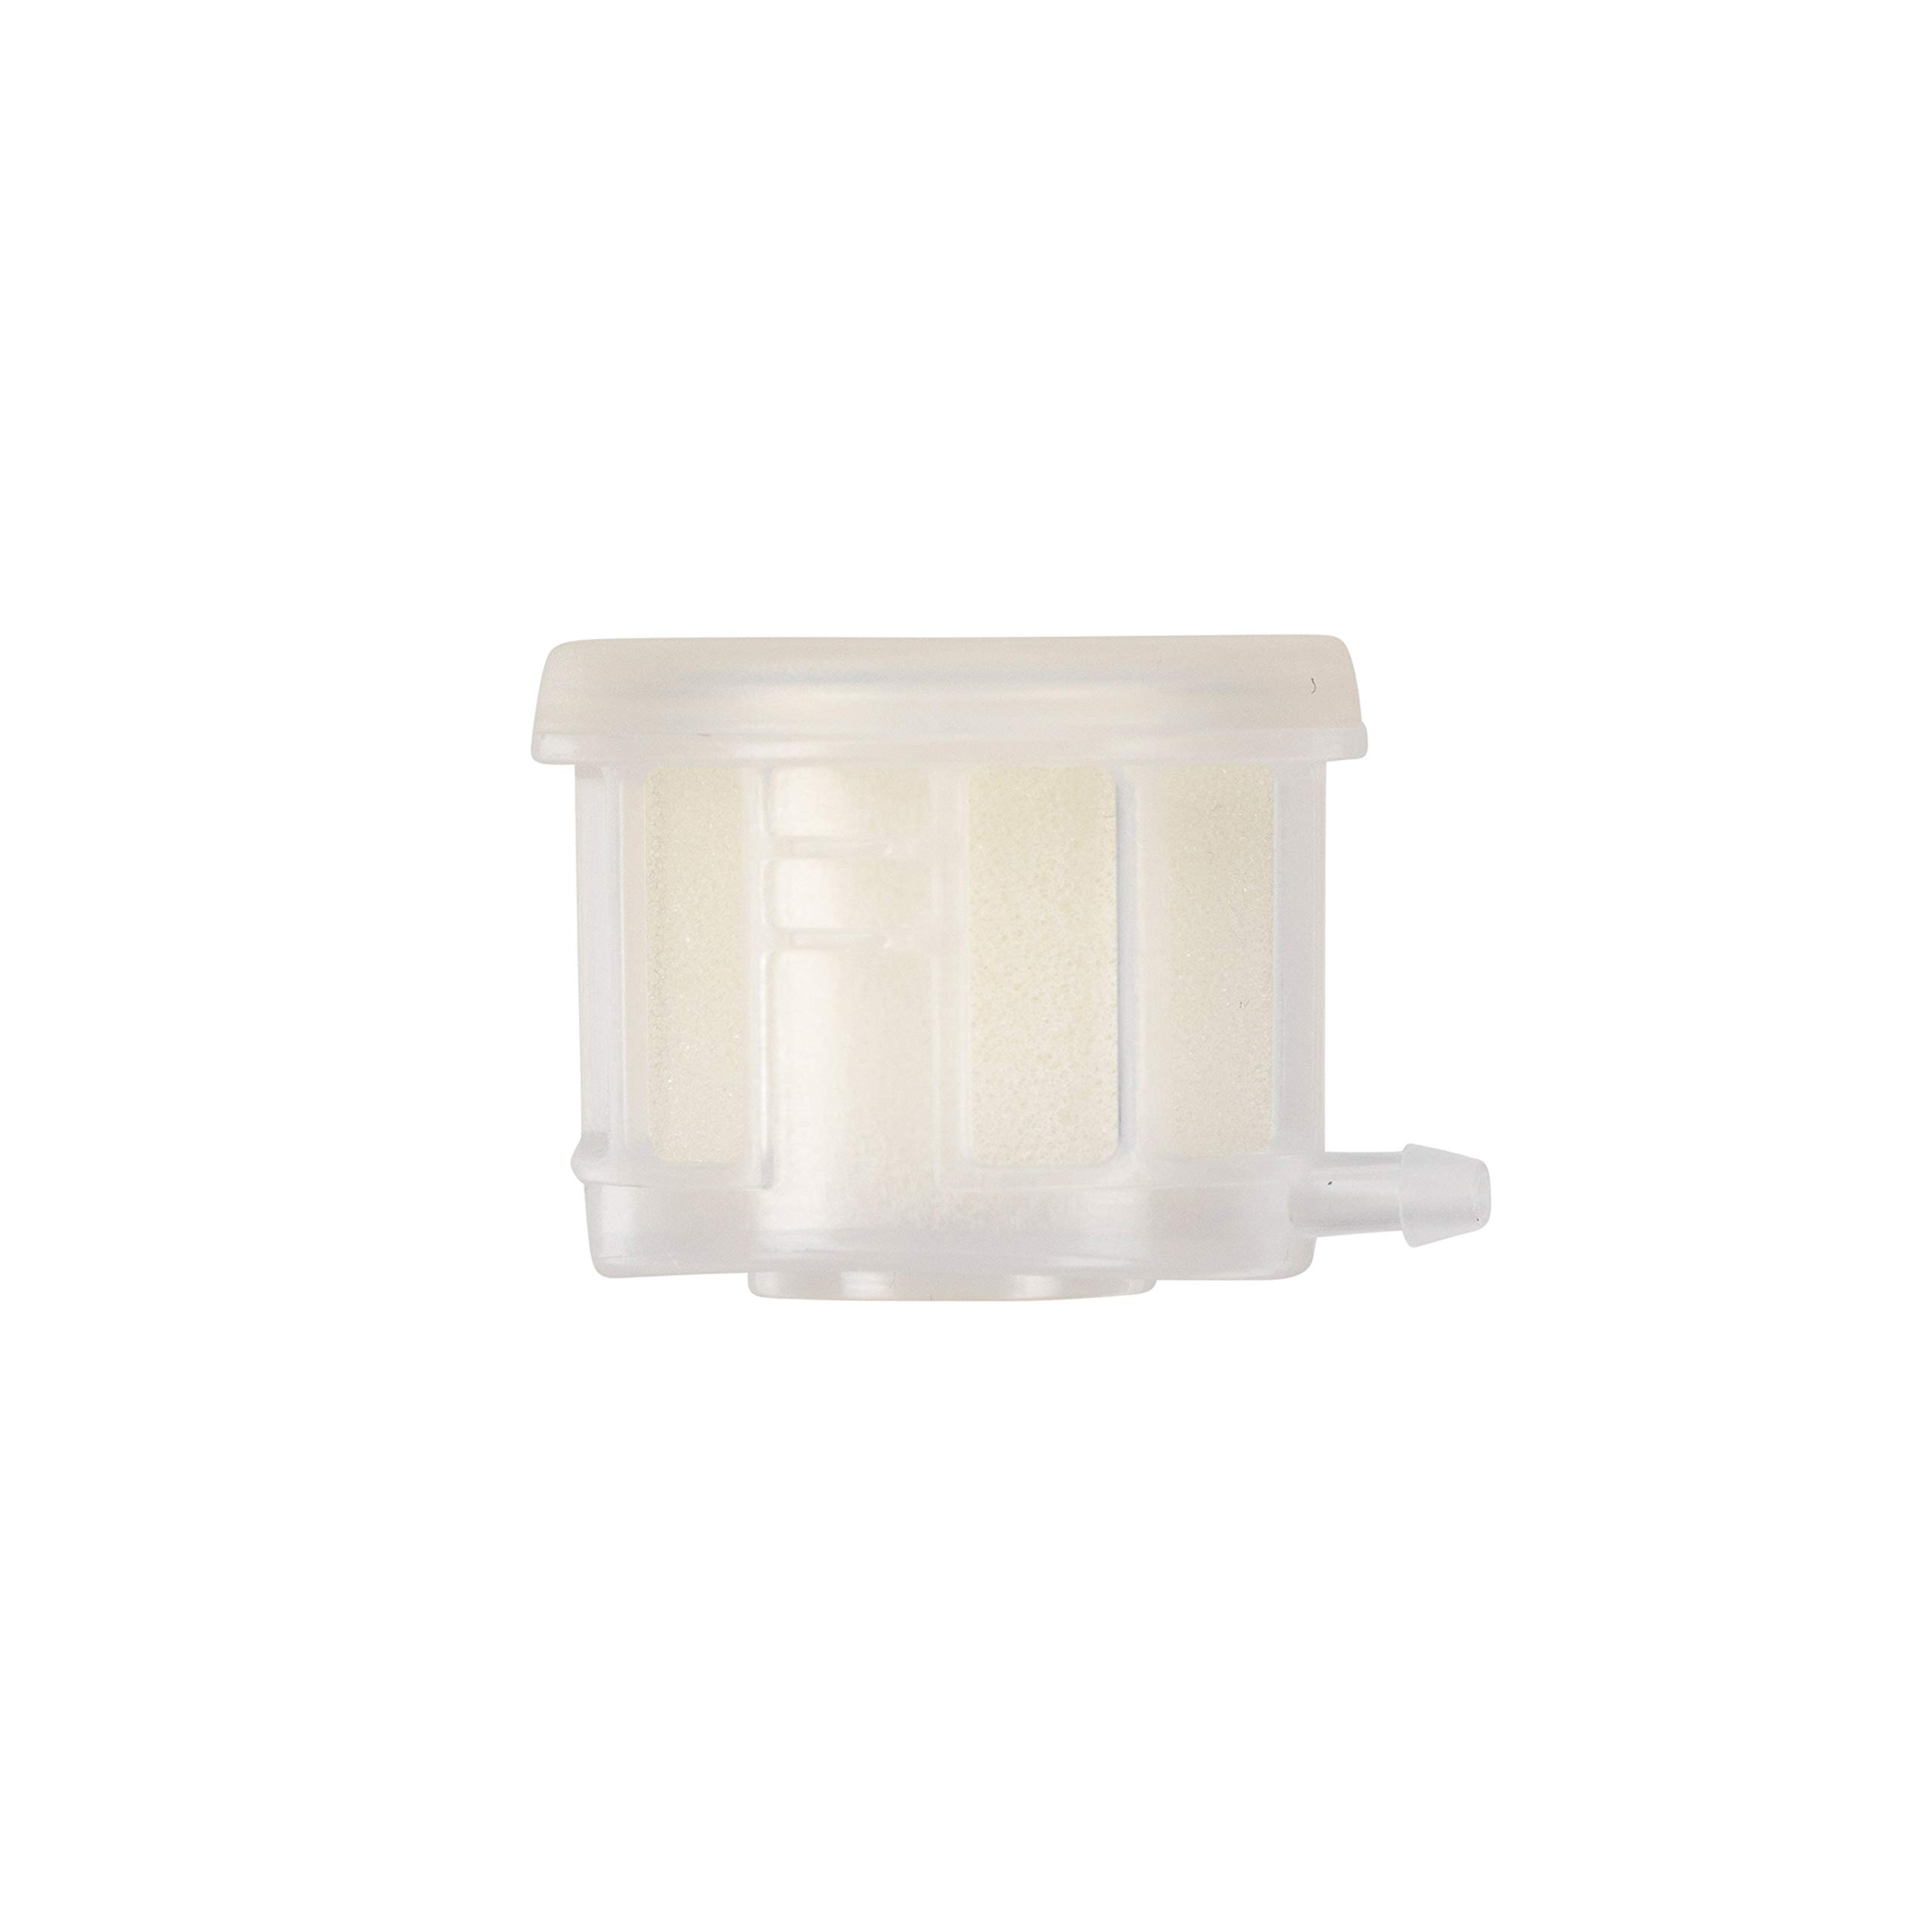 RespVent Tracheostomy Heat and Moisture Exchanger 1000 Oxygen Port, RTG-01050, 50/Box